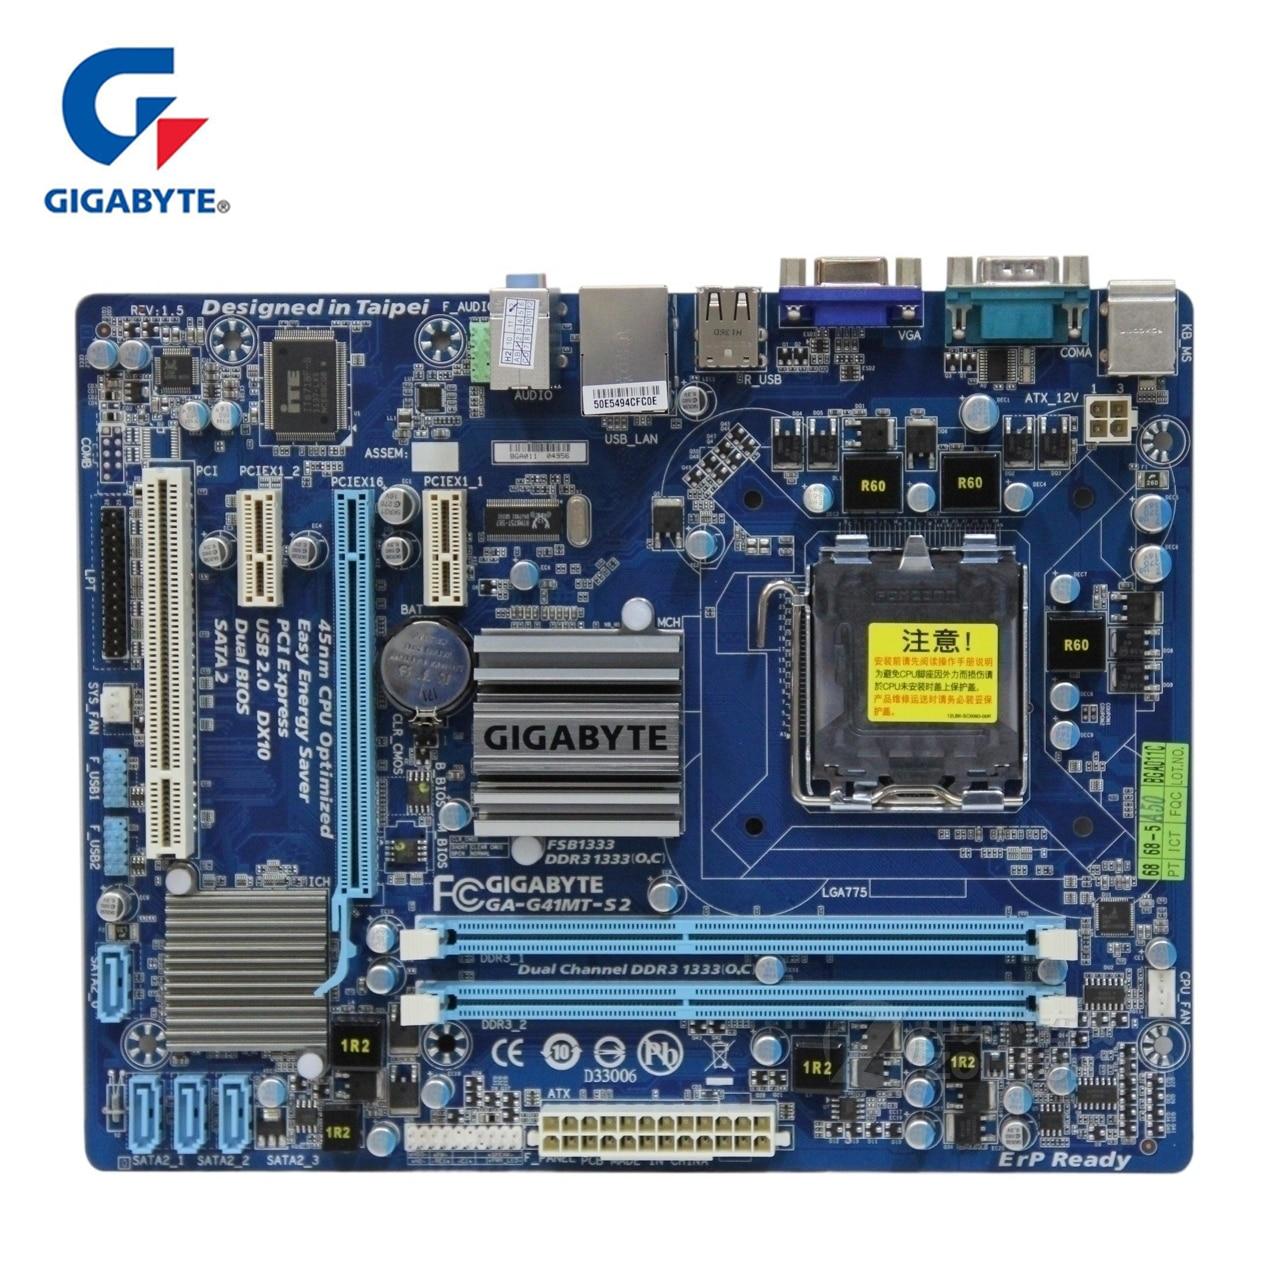 100% Gigabyte GA-G41MT-S2 SATA2 USB2.0 DDR3 Micro ATX Mainboard Desktop Motherboard LGA 775 Para Intel G41 D3H DDR3 G41MT S2 usado